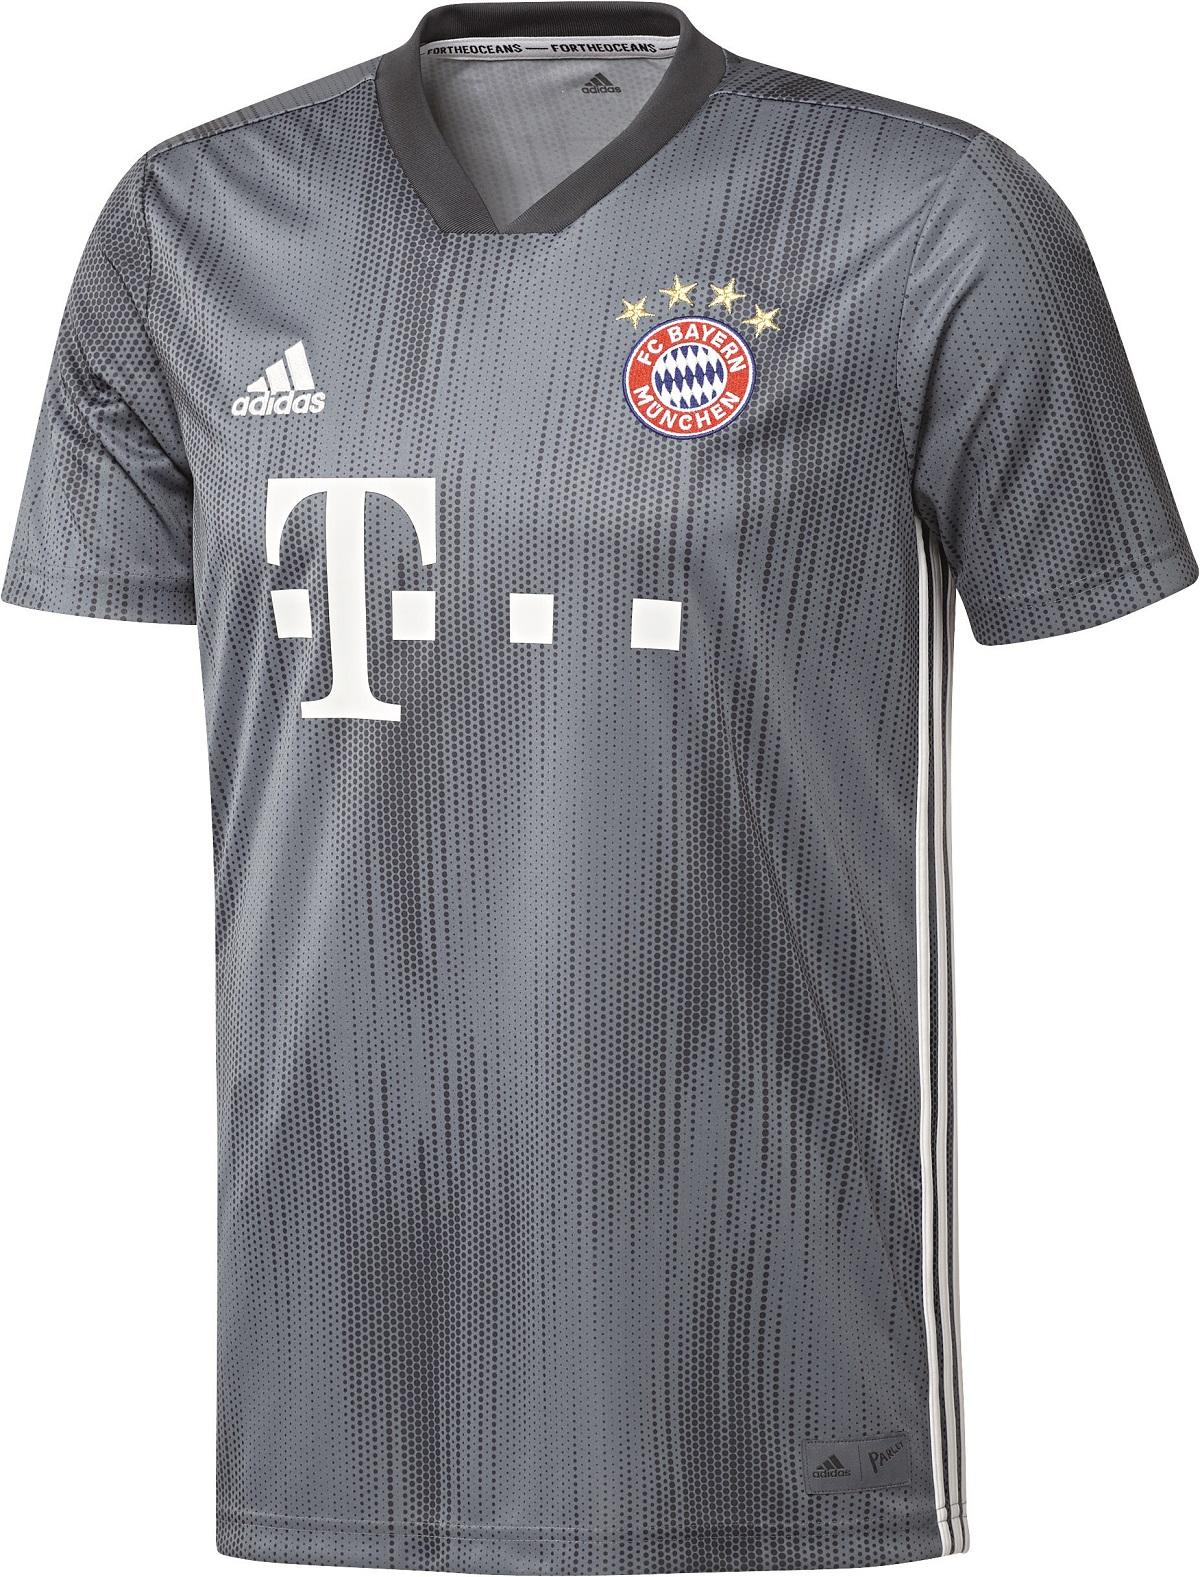 new arrival 7418f 00114 adidas FC BAYERN MÜNCHEN Trikot 3rd Kinder 2018 / 2019